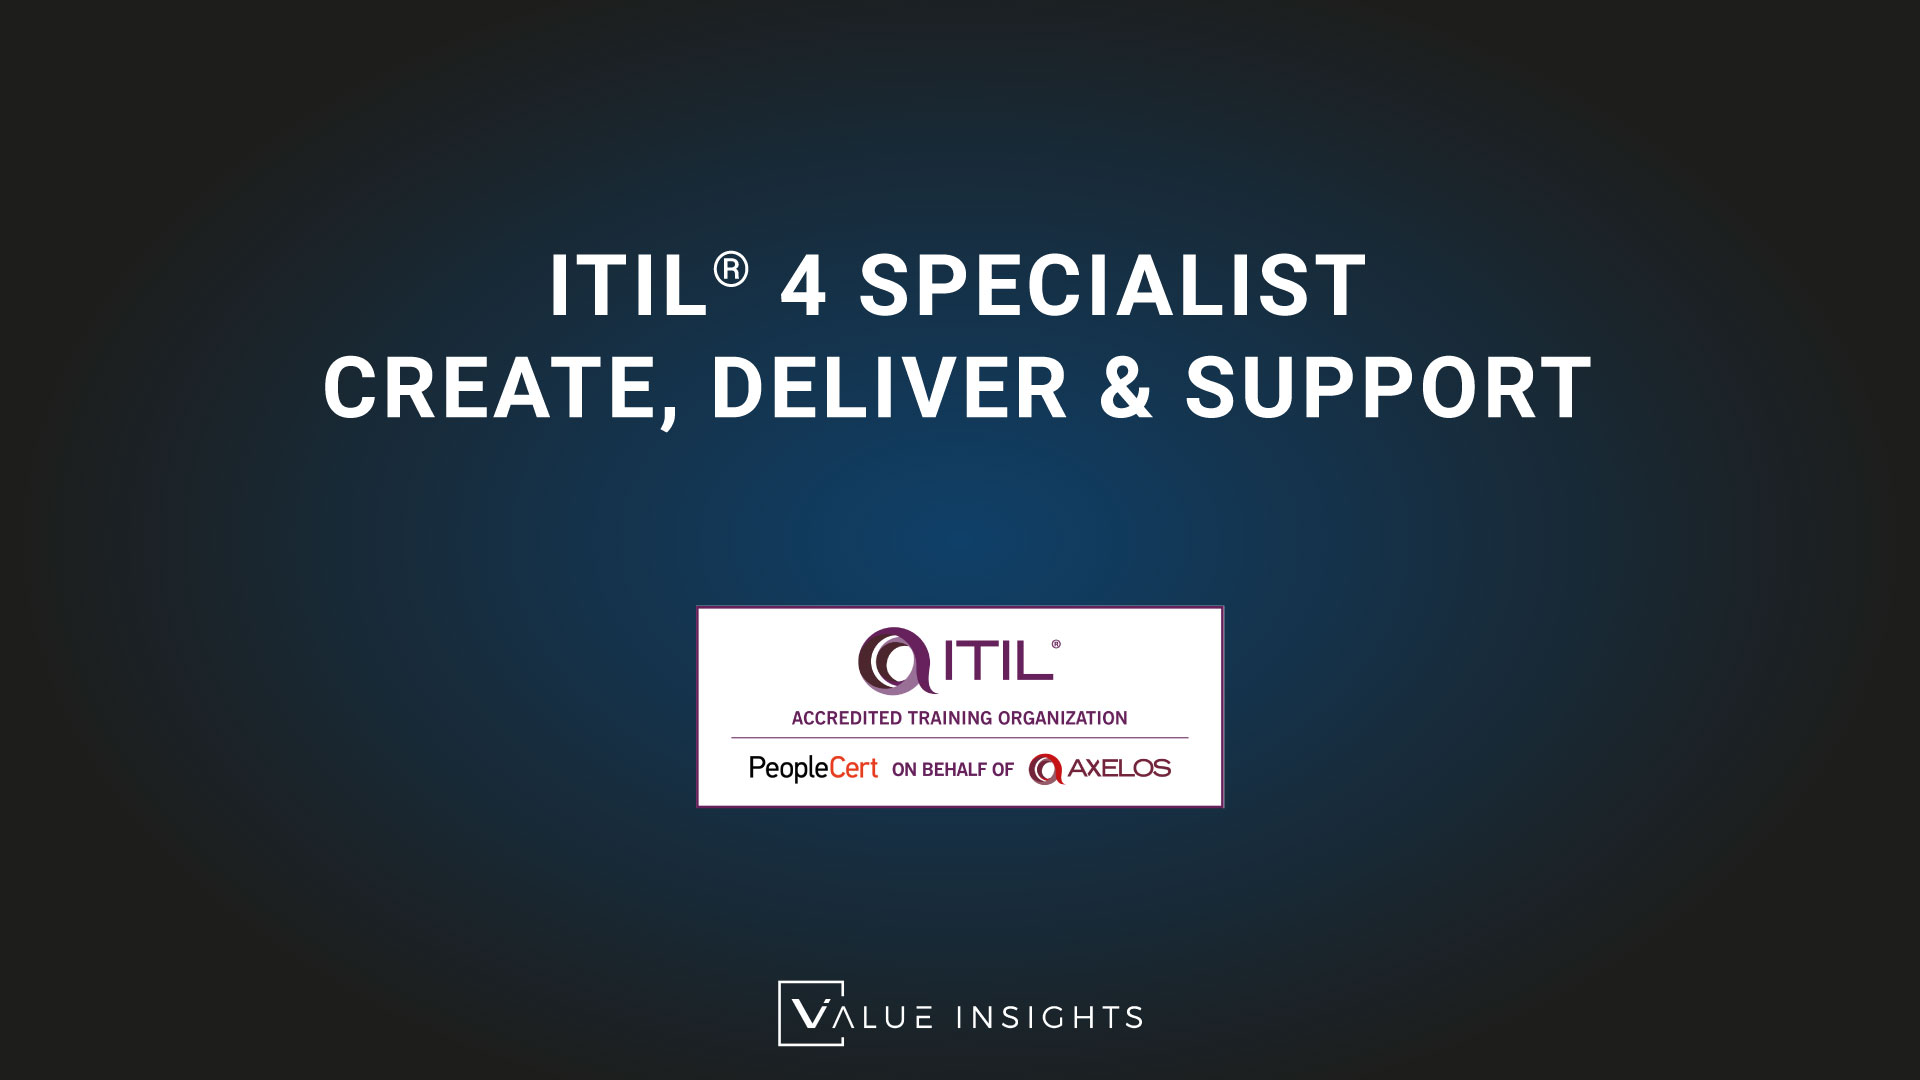 itil 4 specialist cds create deliver support badge cpd transparent logo png